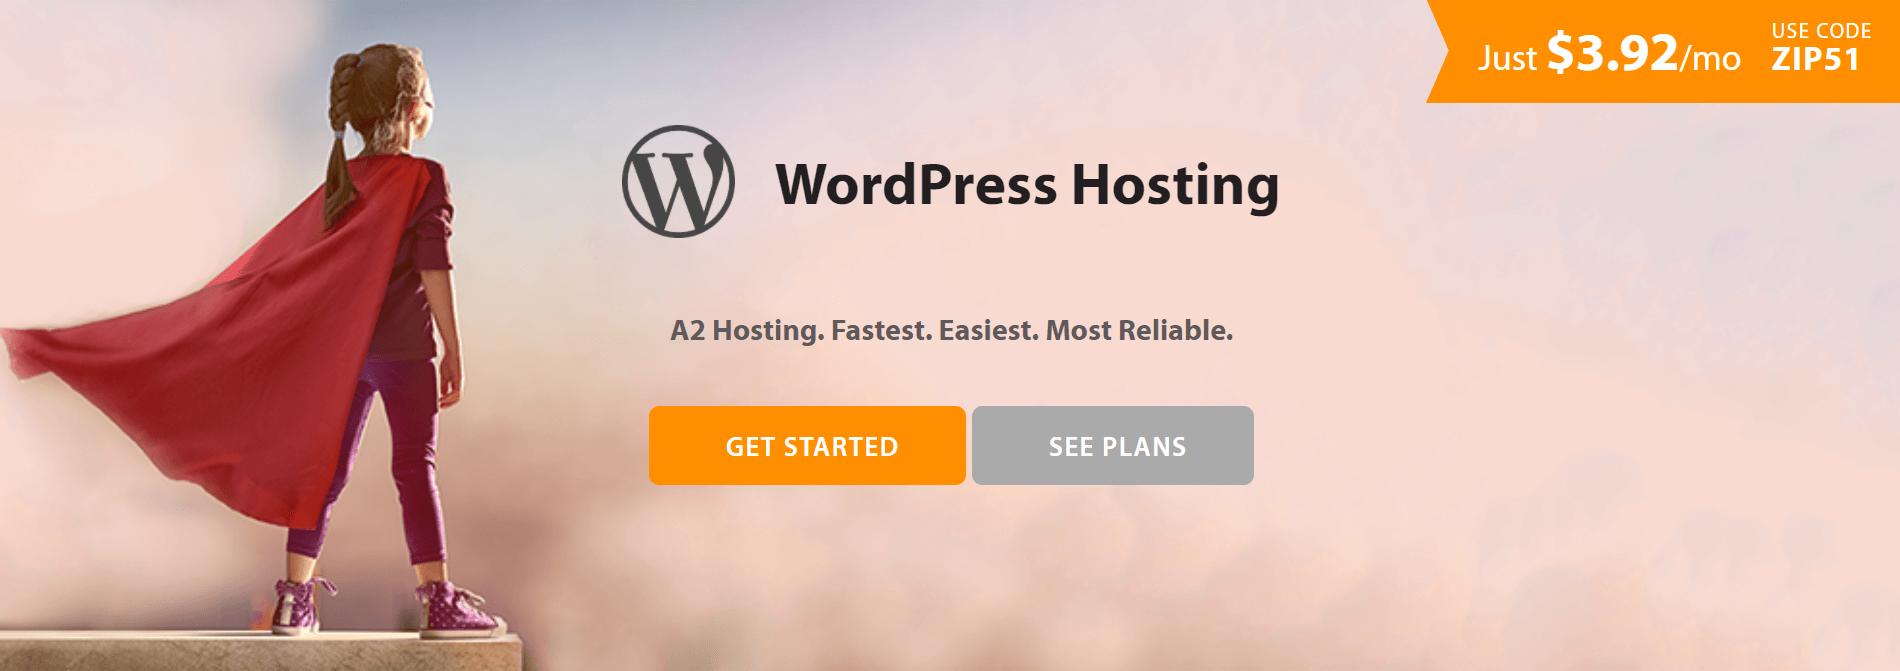 A2 Hosting WordPress hosting.